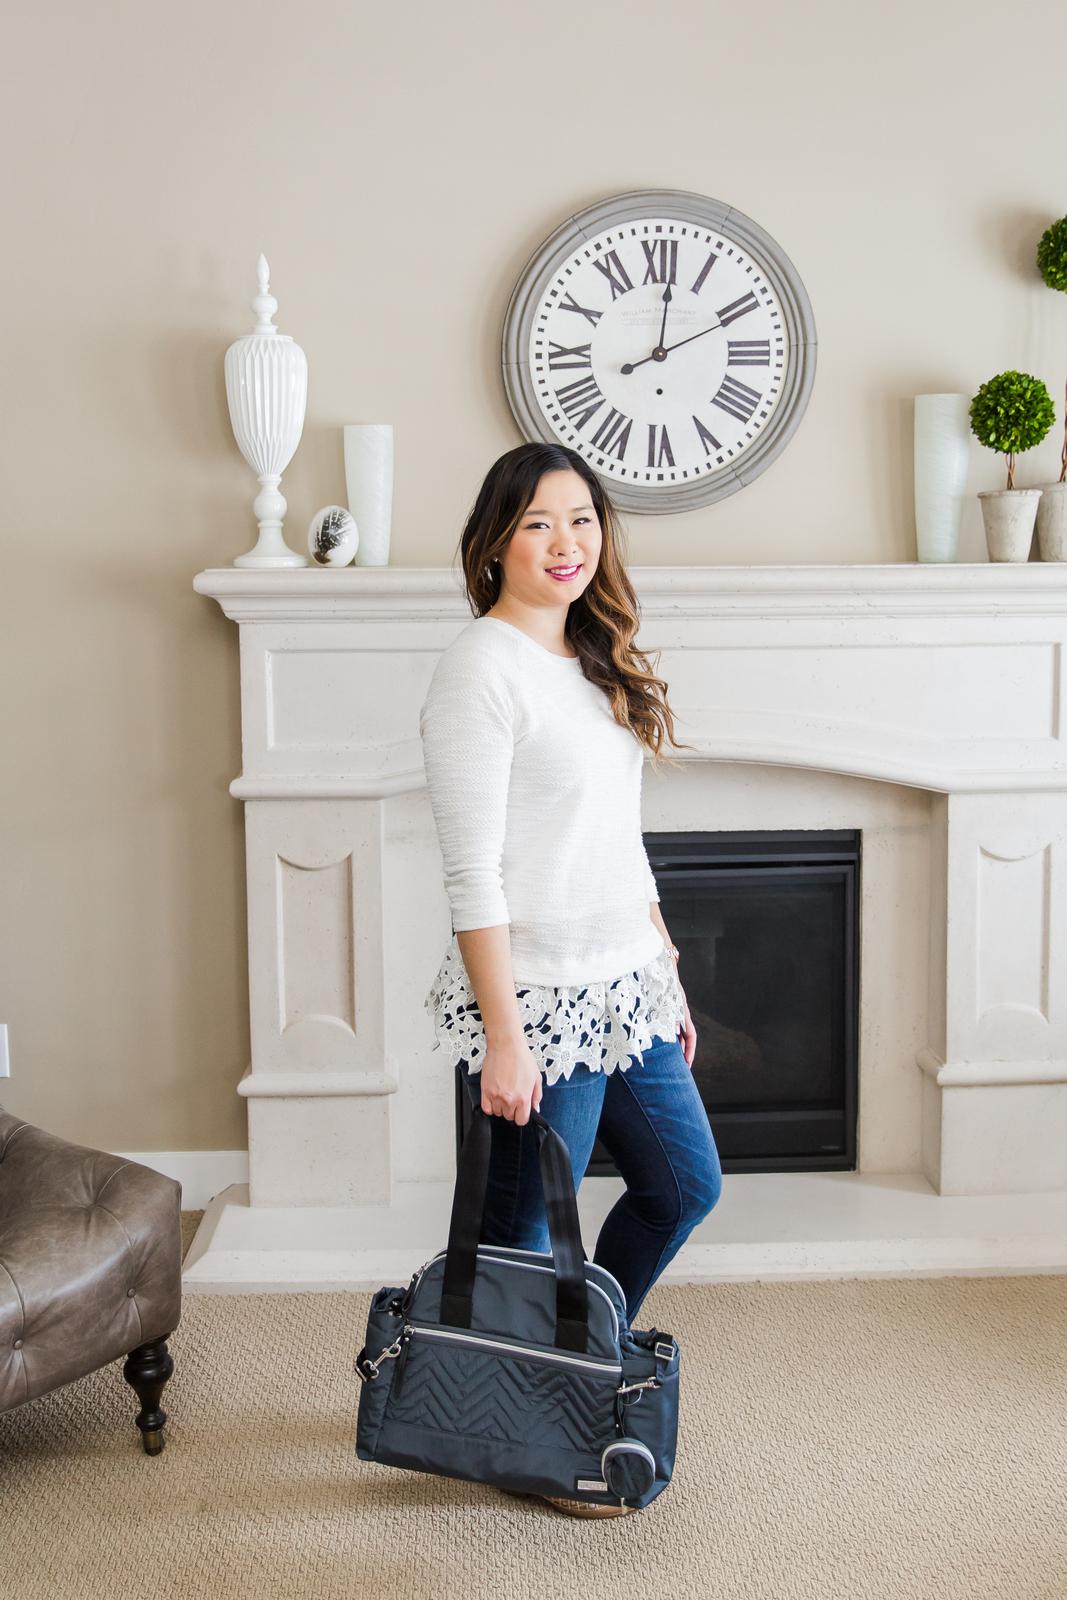 Skip Hop Suite Designer Diaper Bags: the satchel set